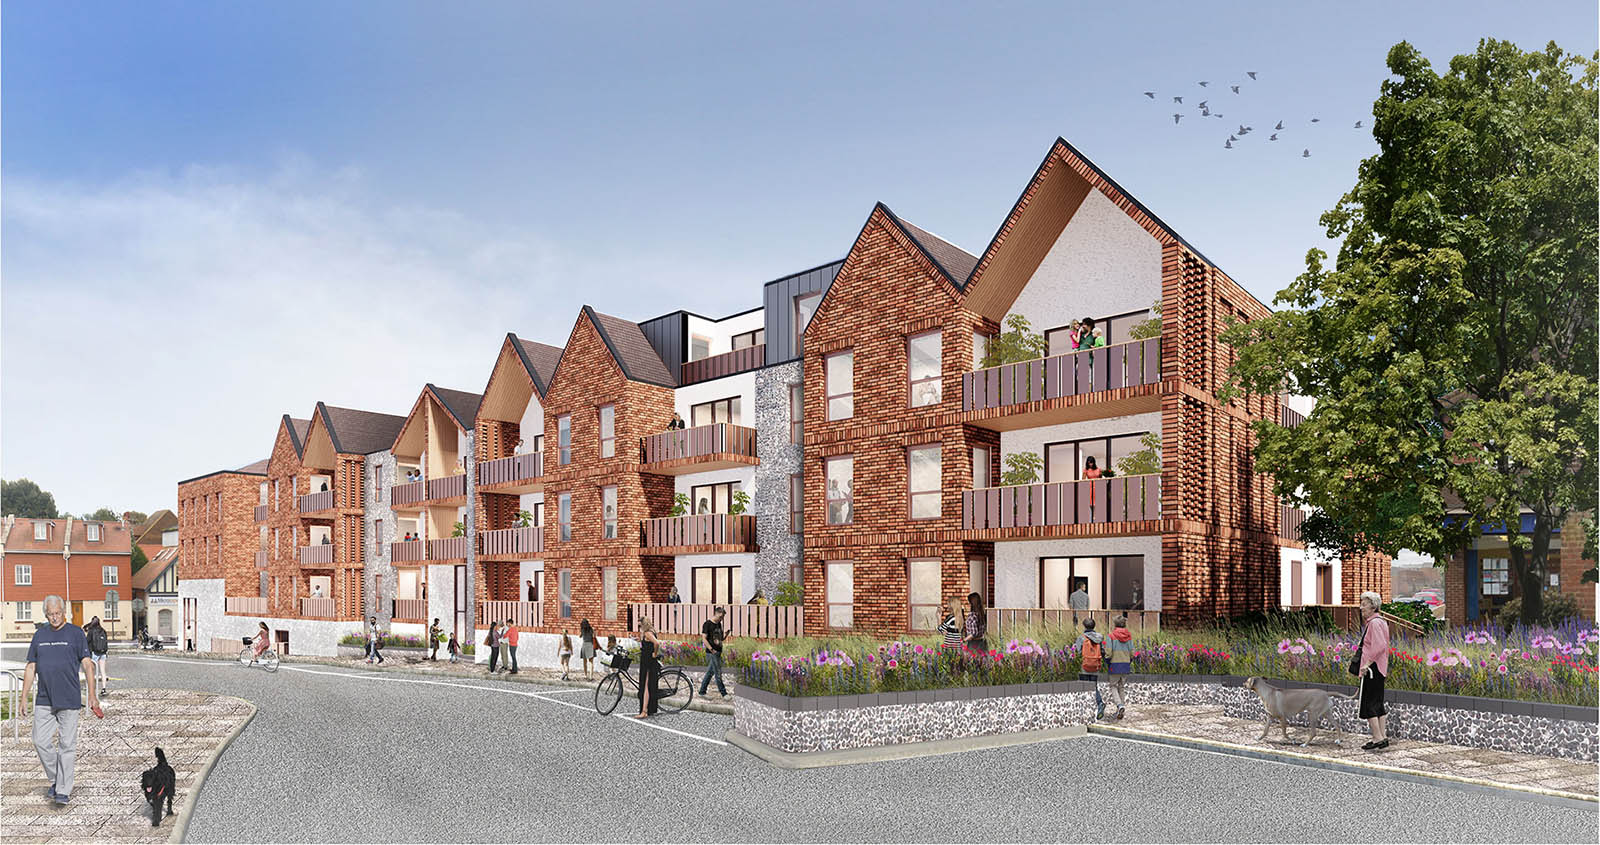 Residential Scheme Littlehampton by POD